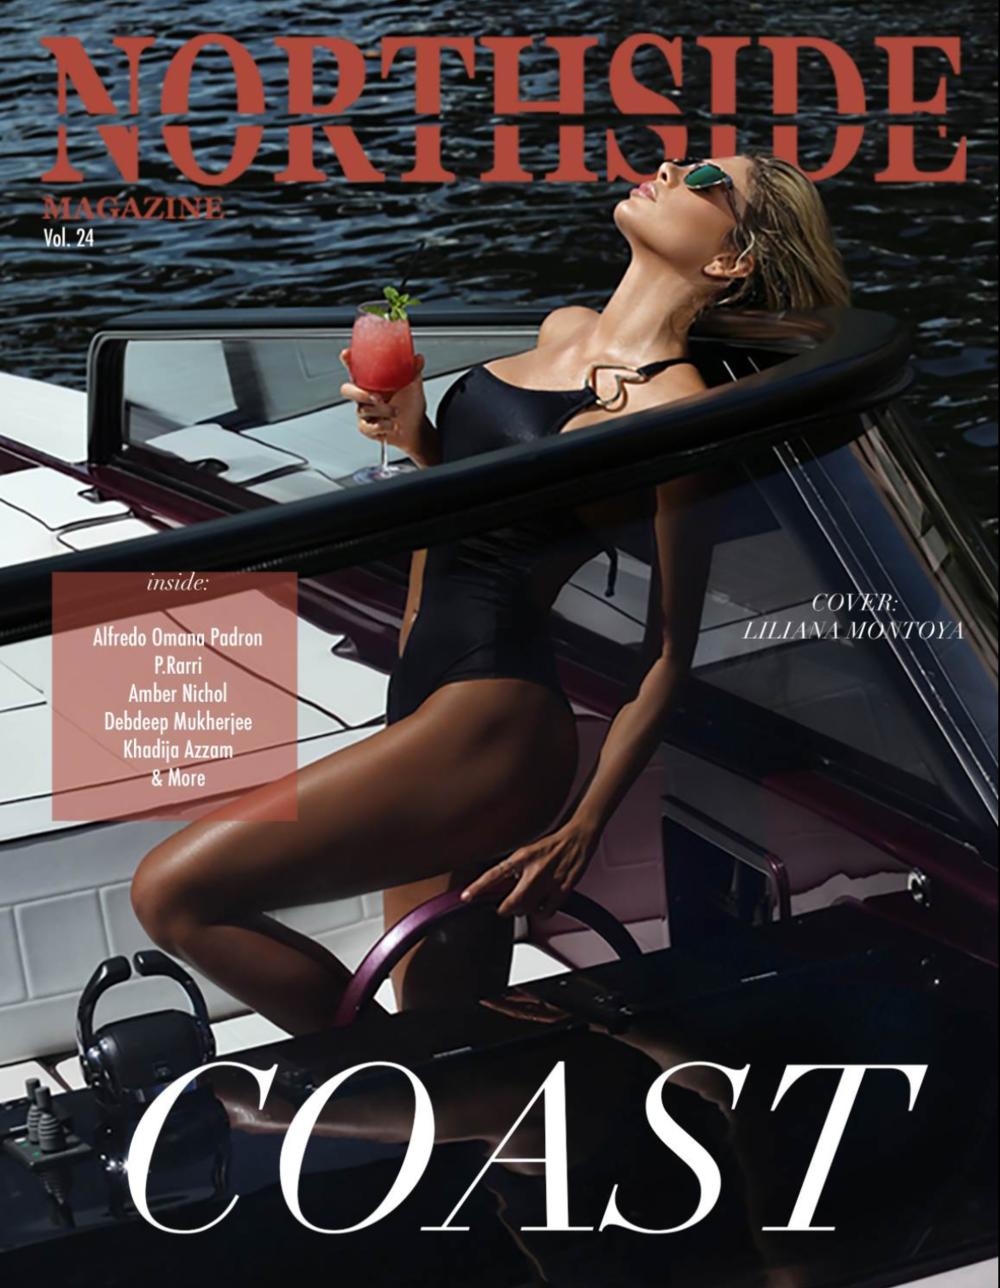 Liliana Montoya for NORTHSIDE Magazine secured by Nova Prime PR